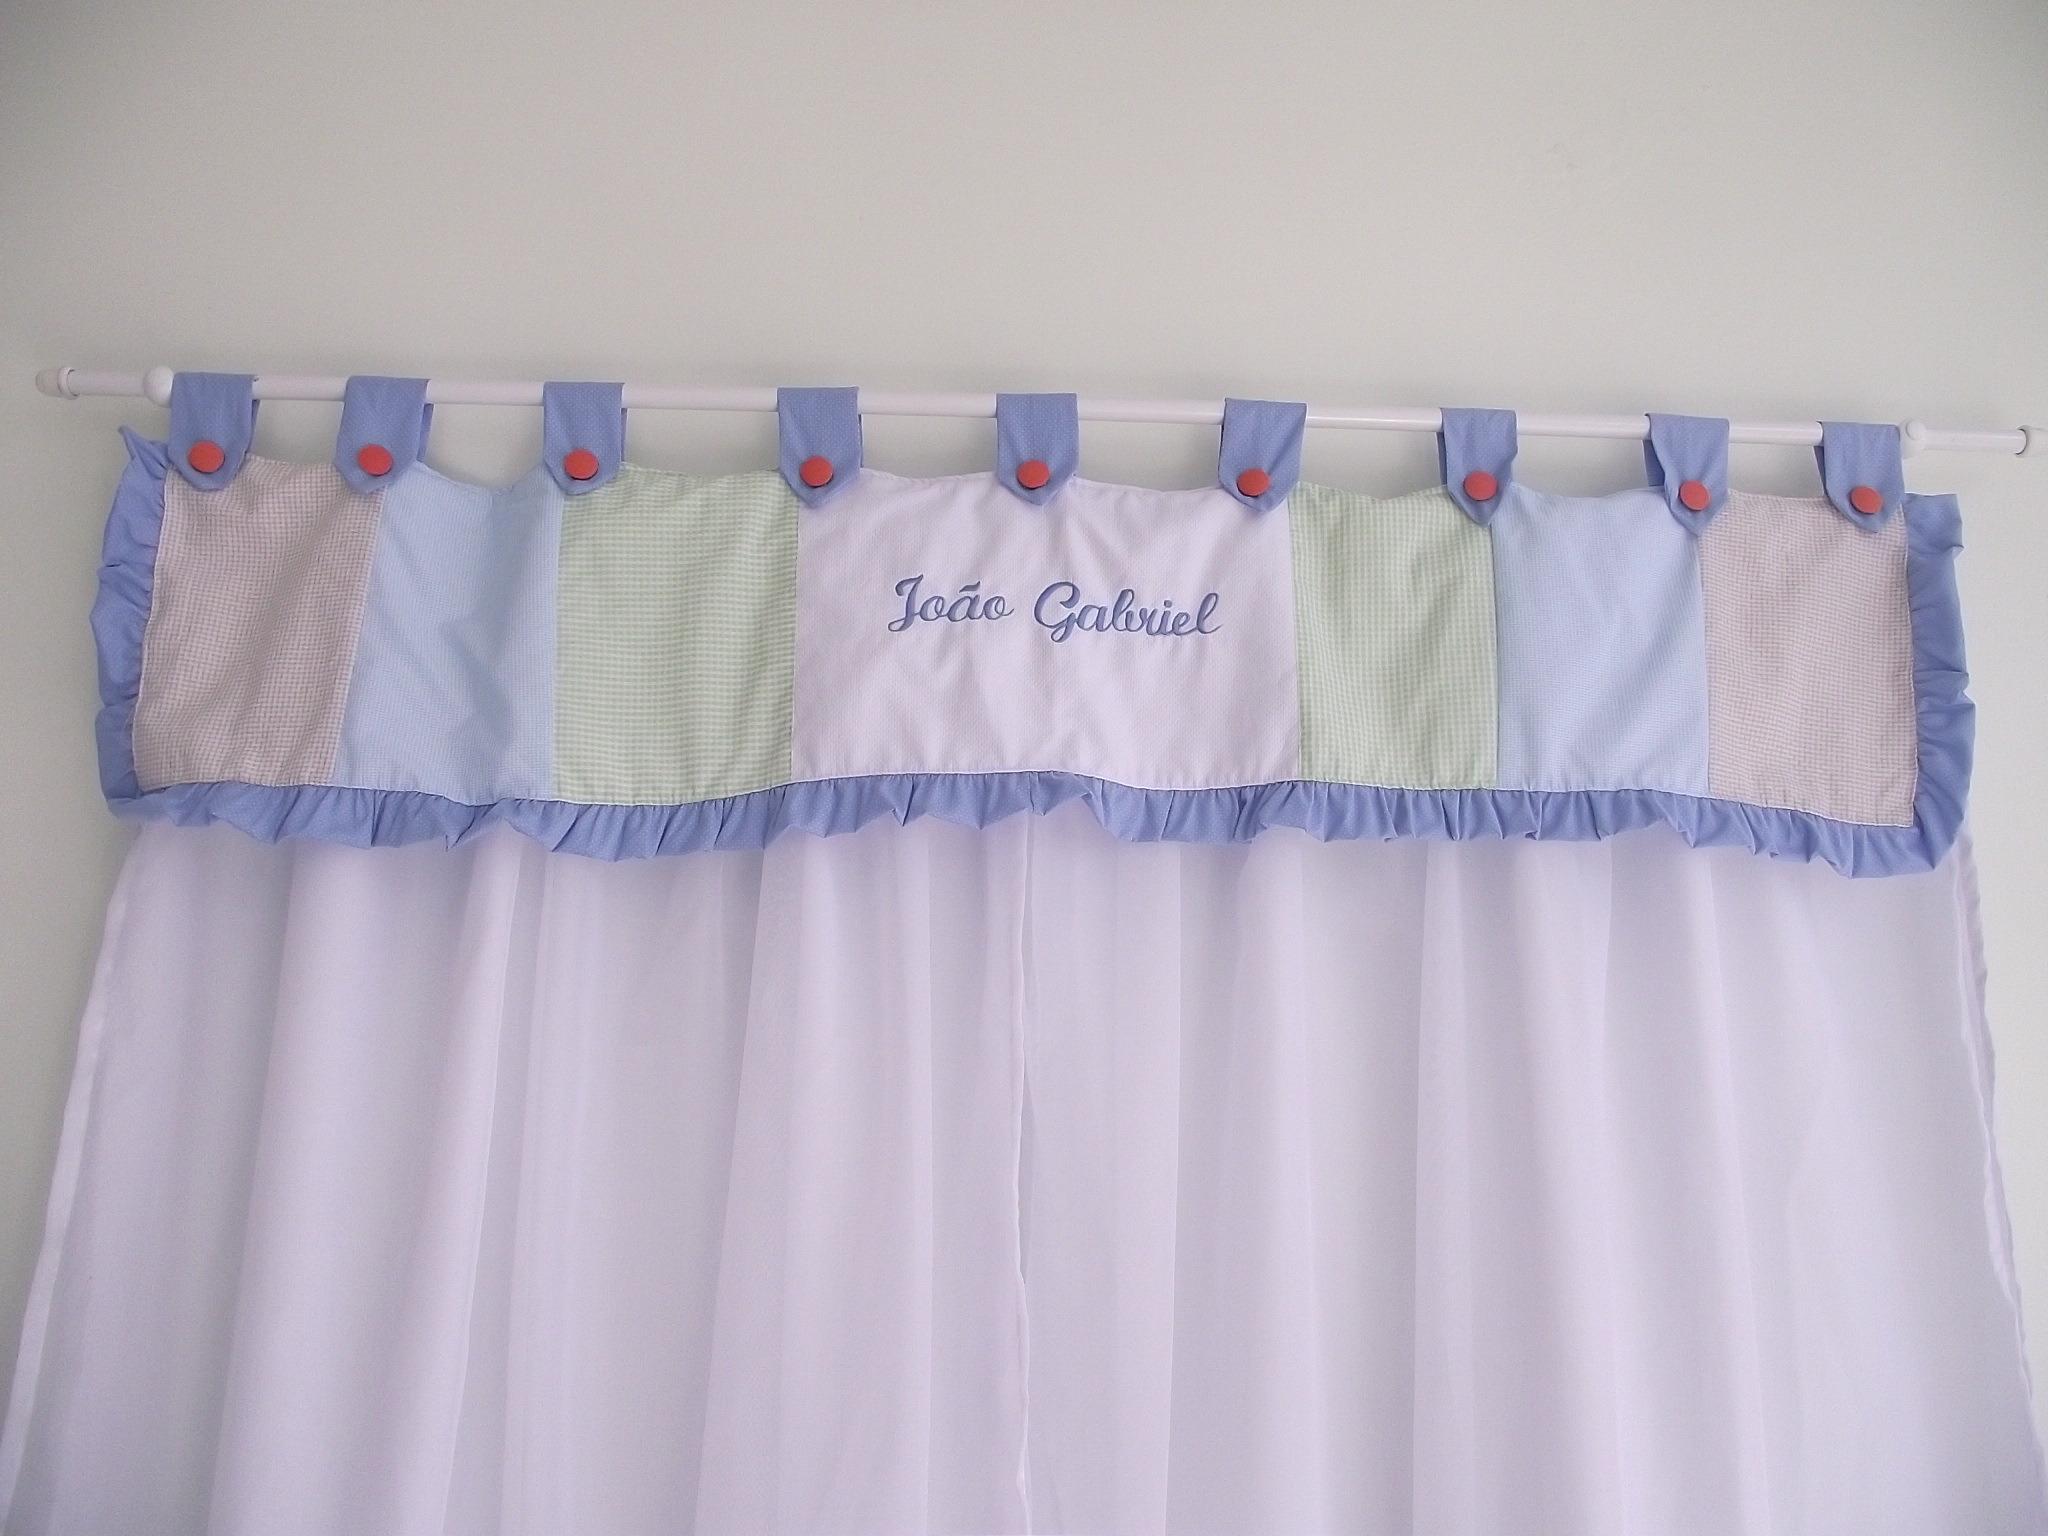 Cortina para quarto beb personalizada sonho de beb - Cortinas para nino ...